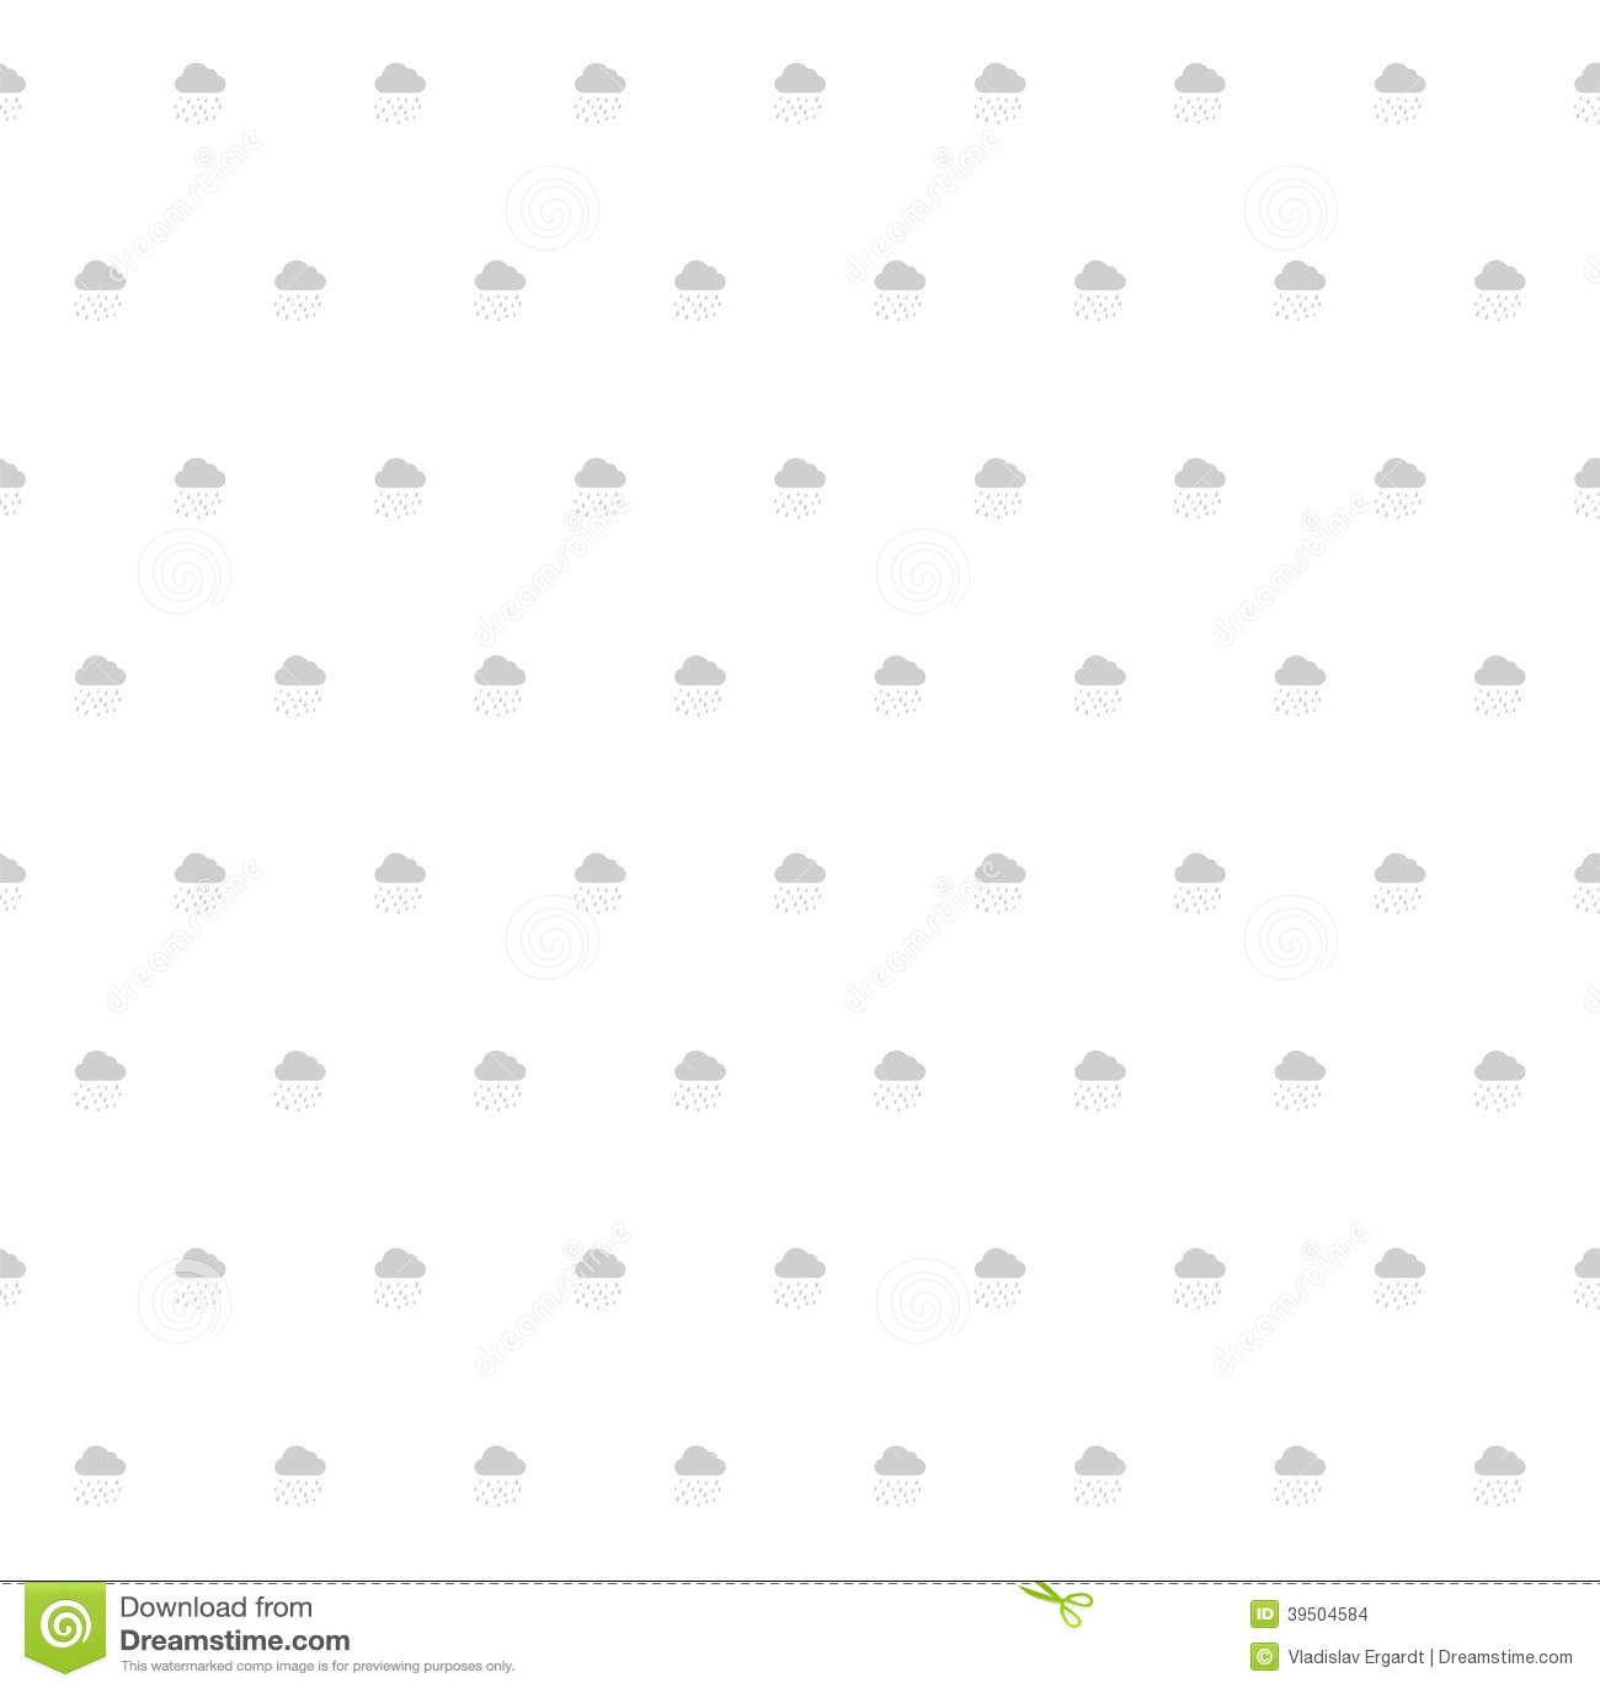 Simple seamless minimalistic pattern